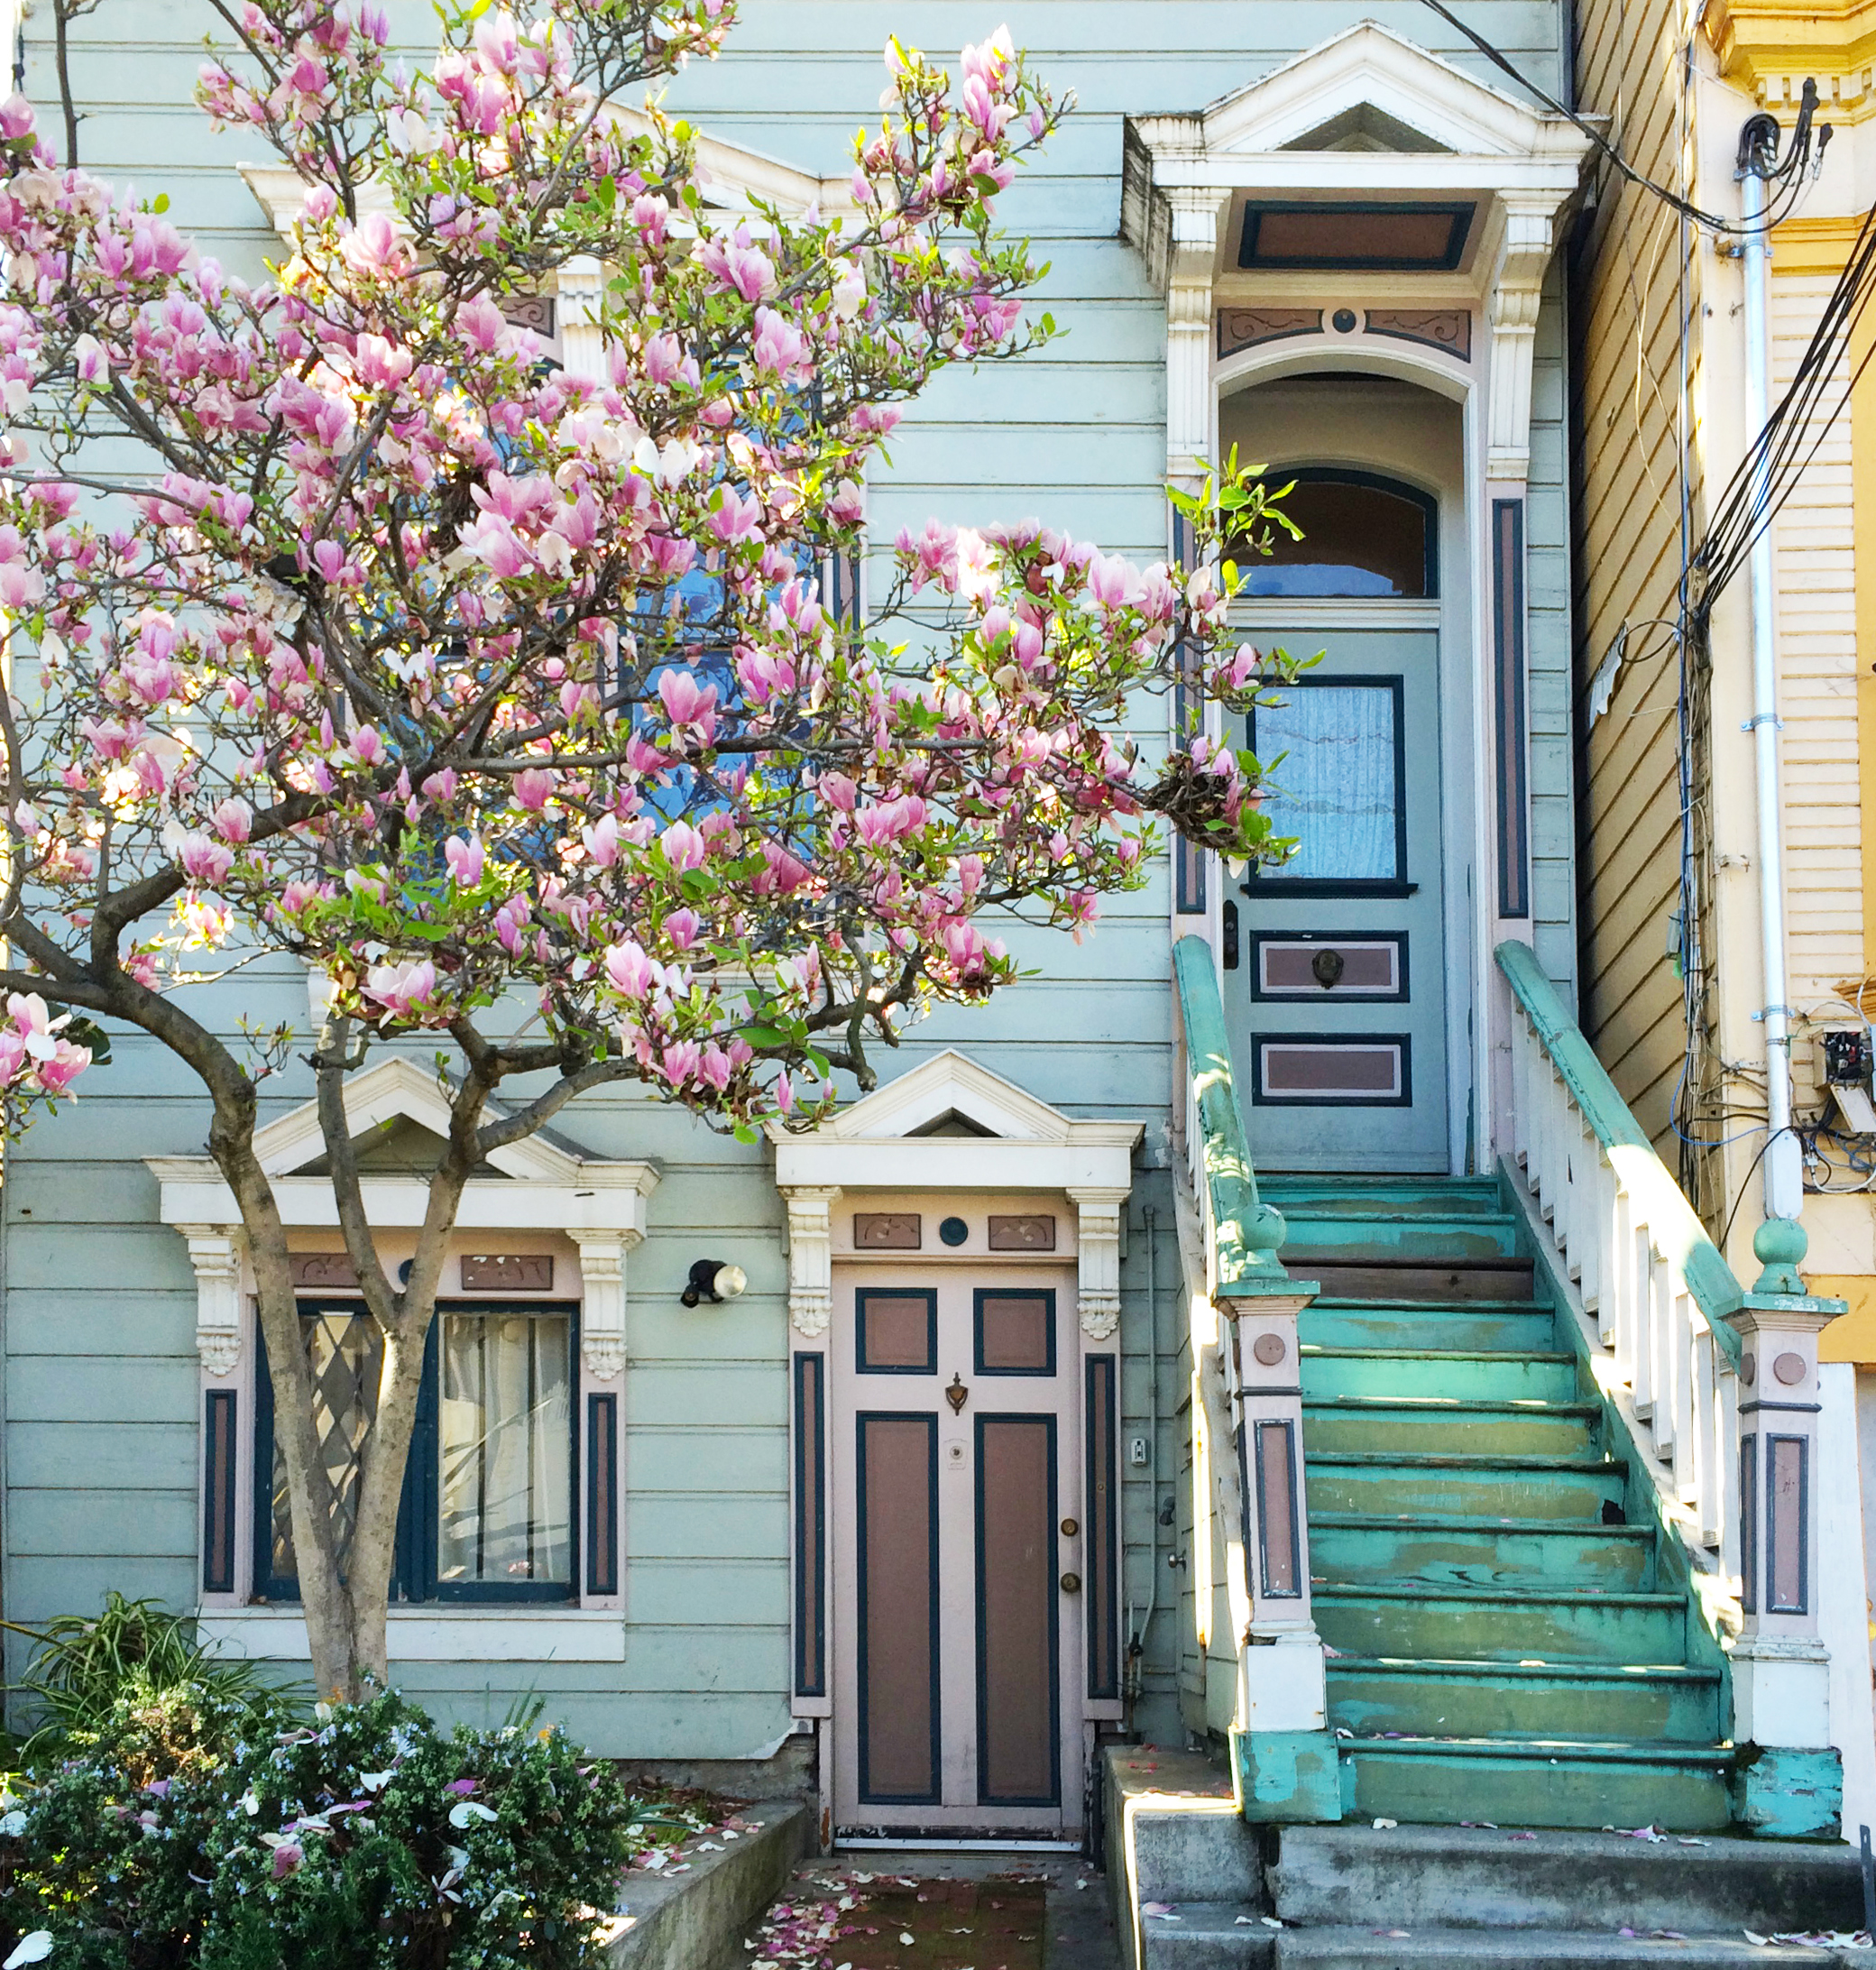 24th street in bloom